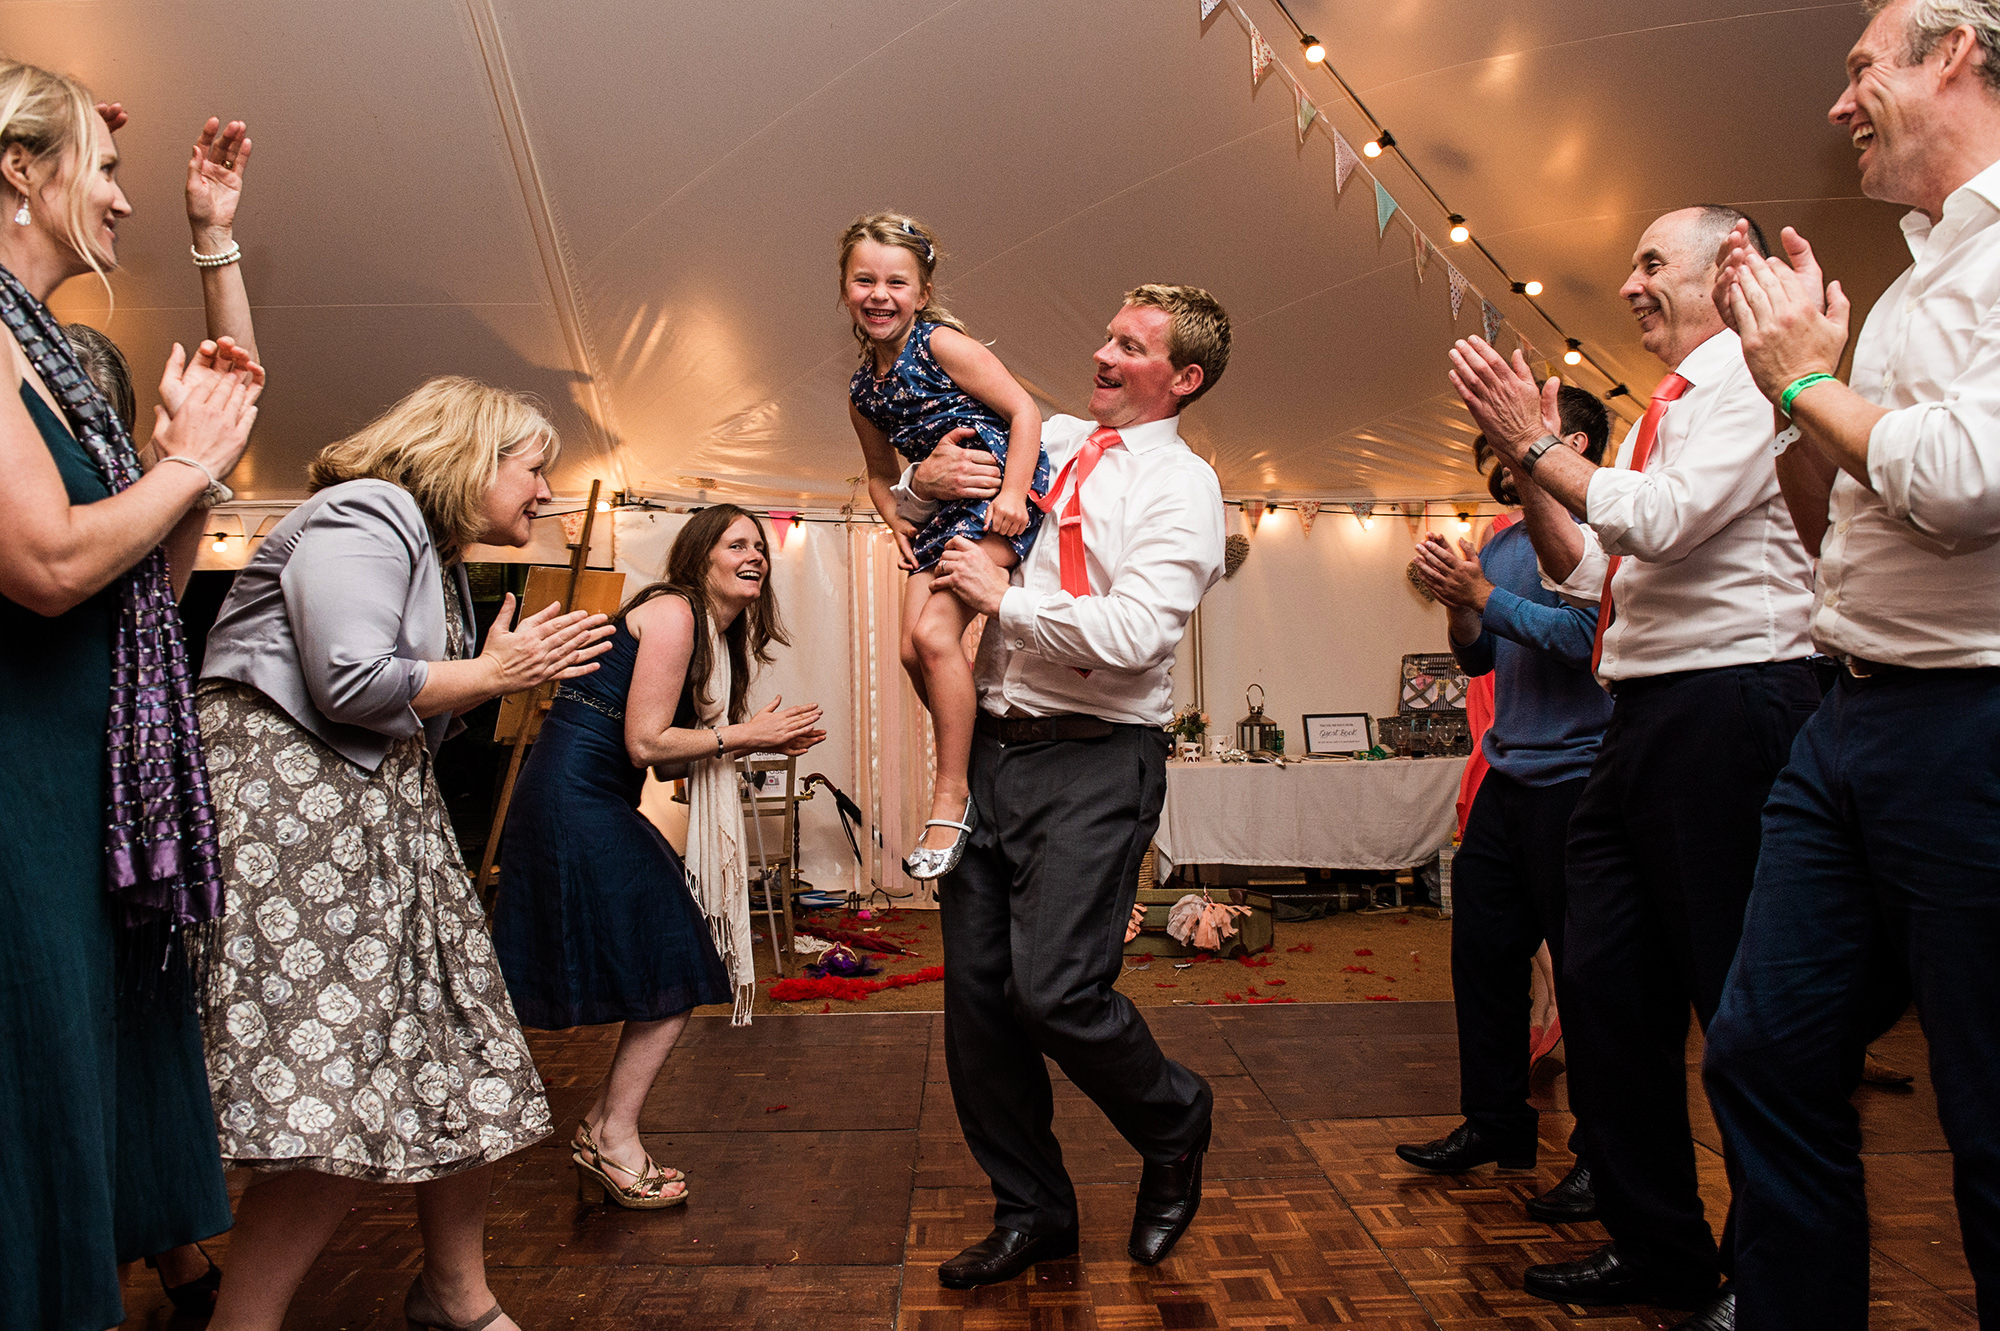 Simon biffen-best of 2015 wedding photographs-55